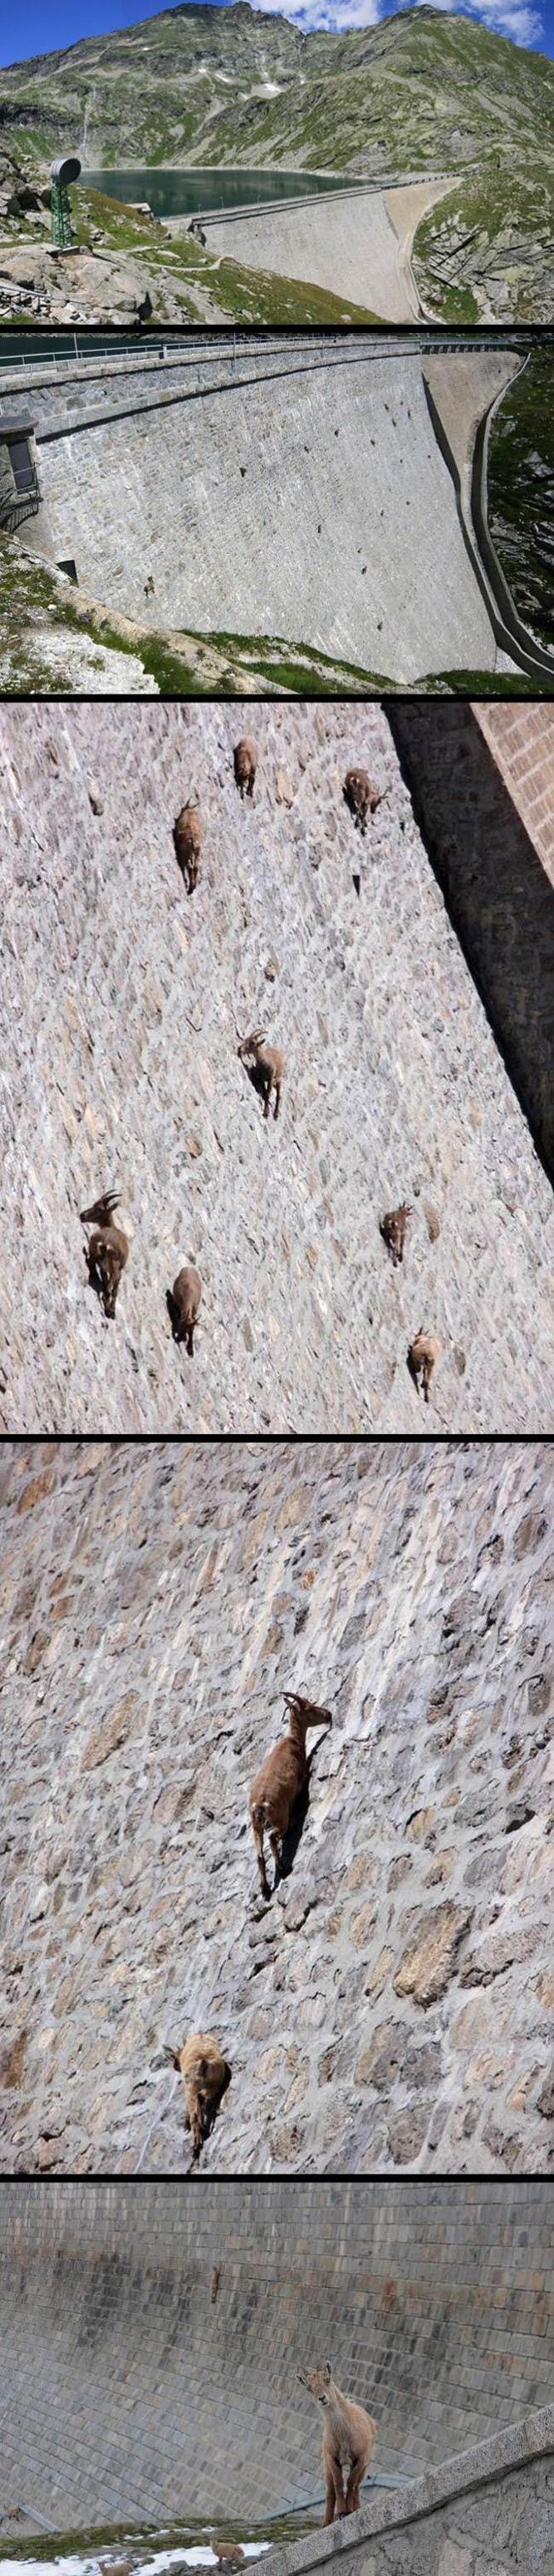 Perierga.gr - Κατσίκες σε φράγμα